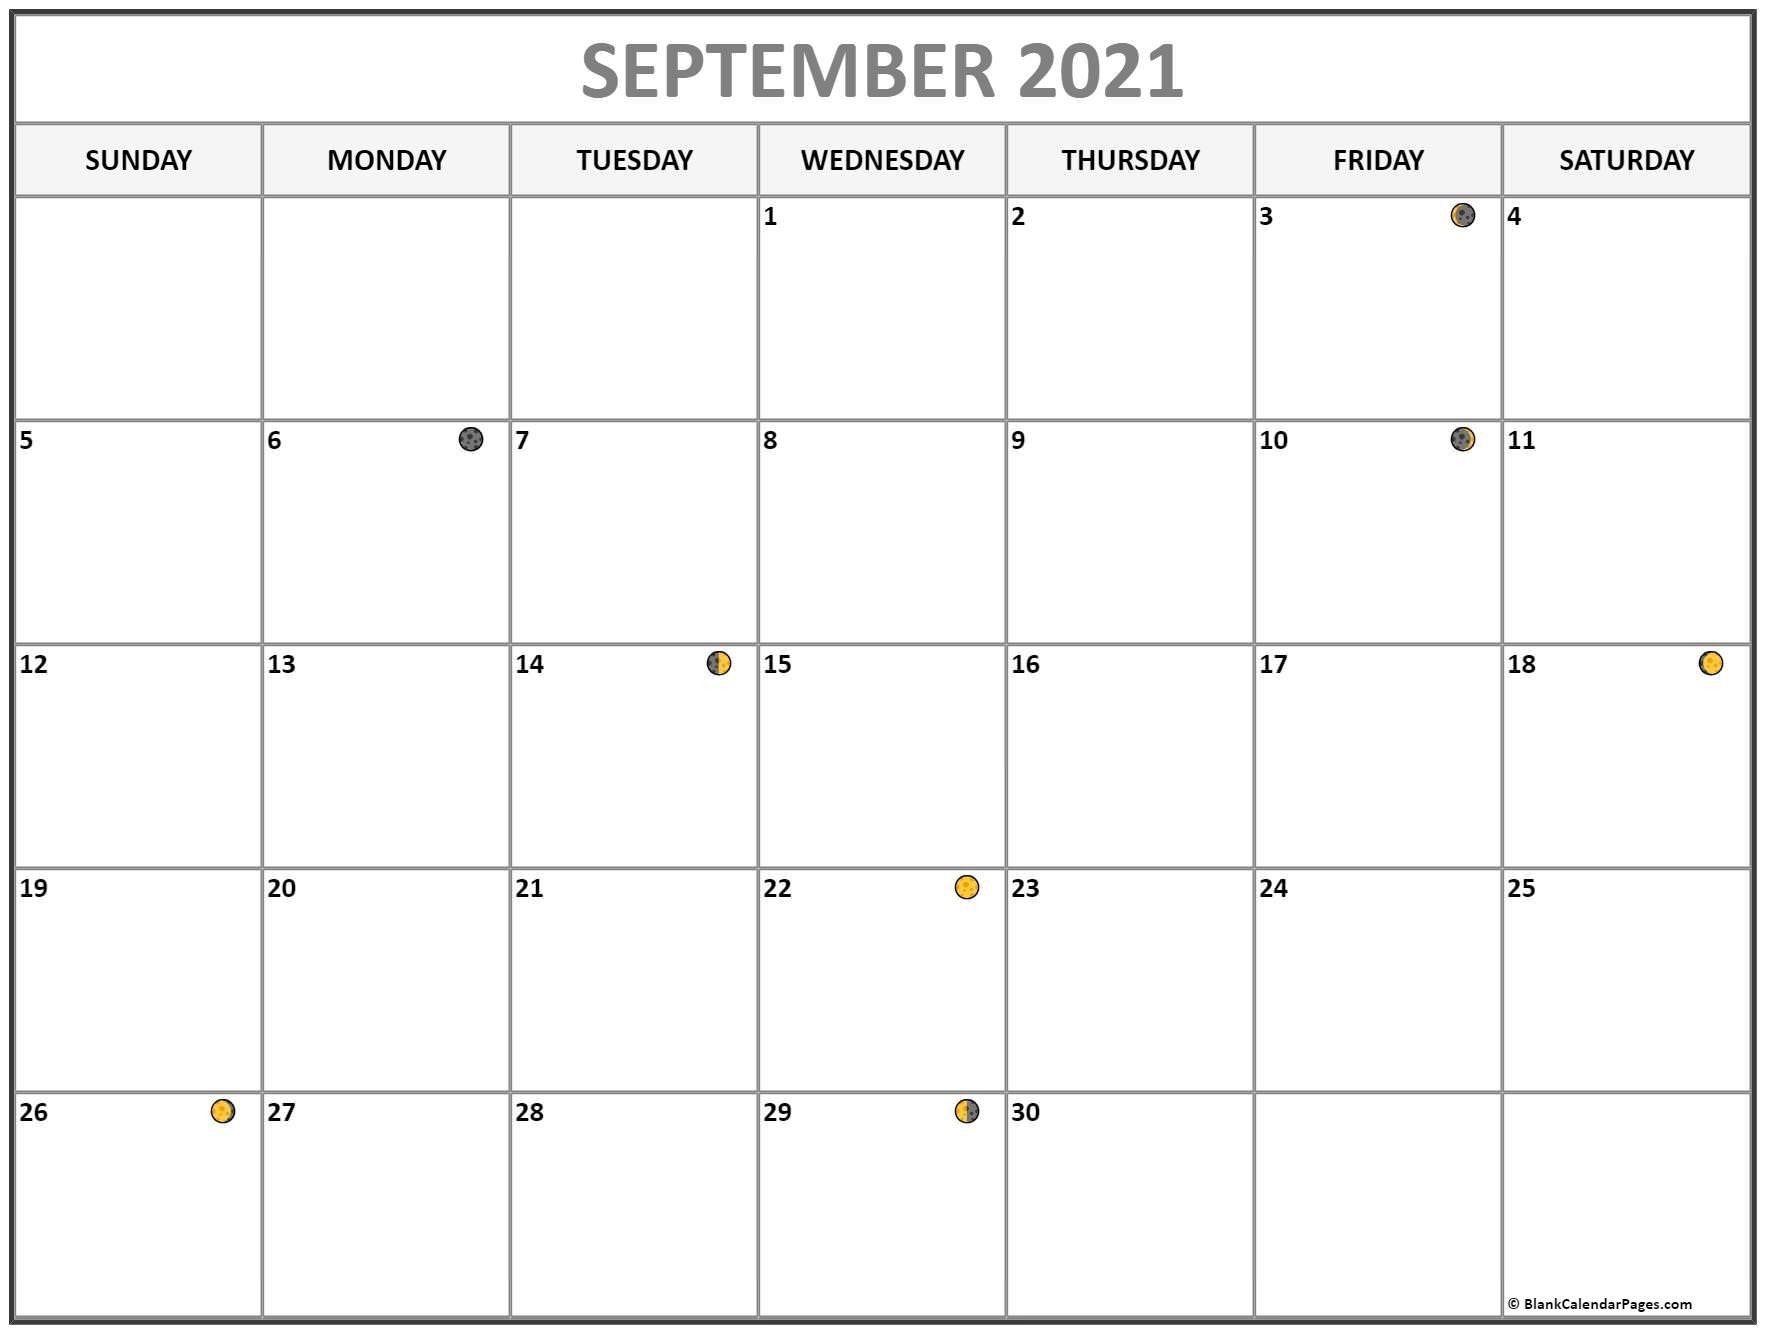 September 2021 Lunar Calendar | Moon Phase Calendar